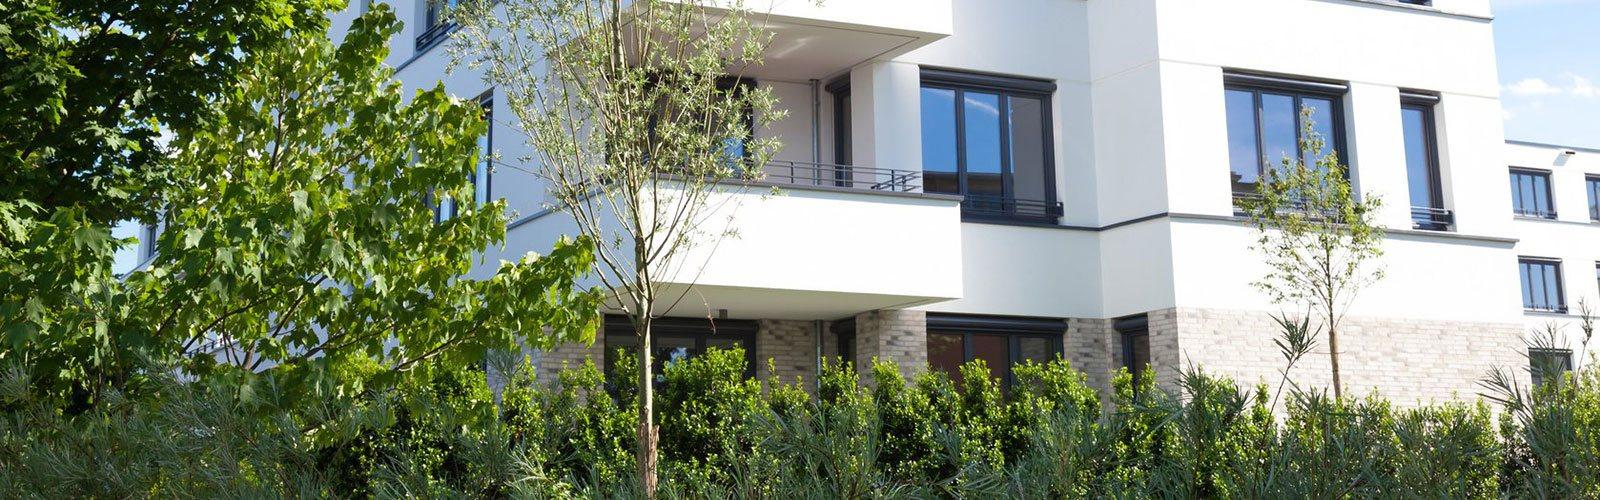 modernes Mehrfamilienhaus